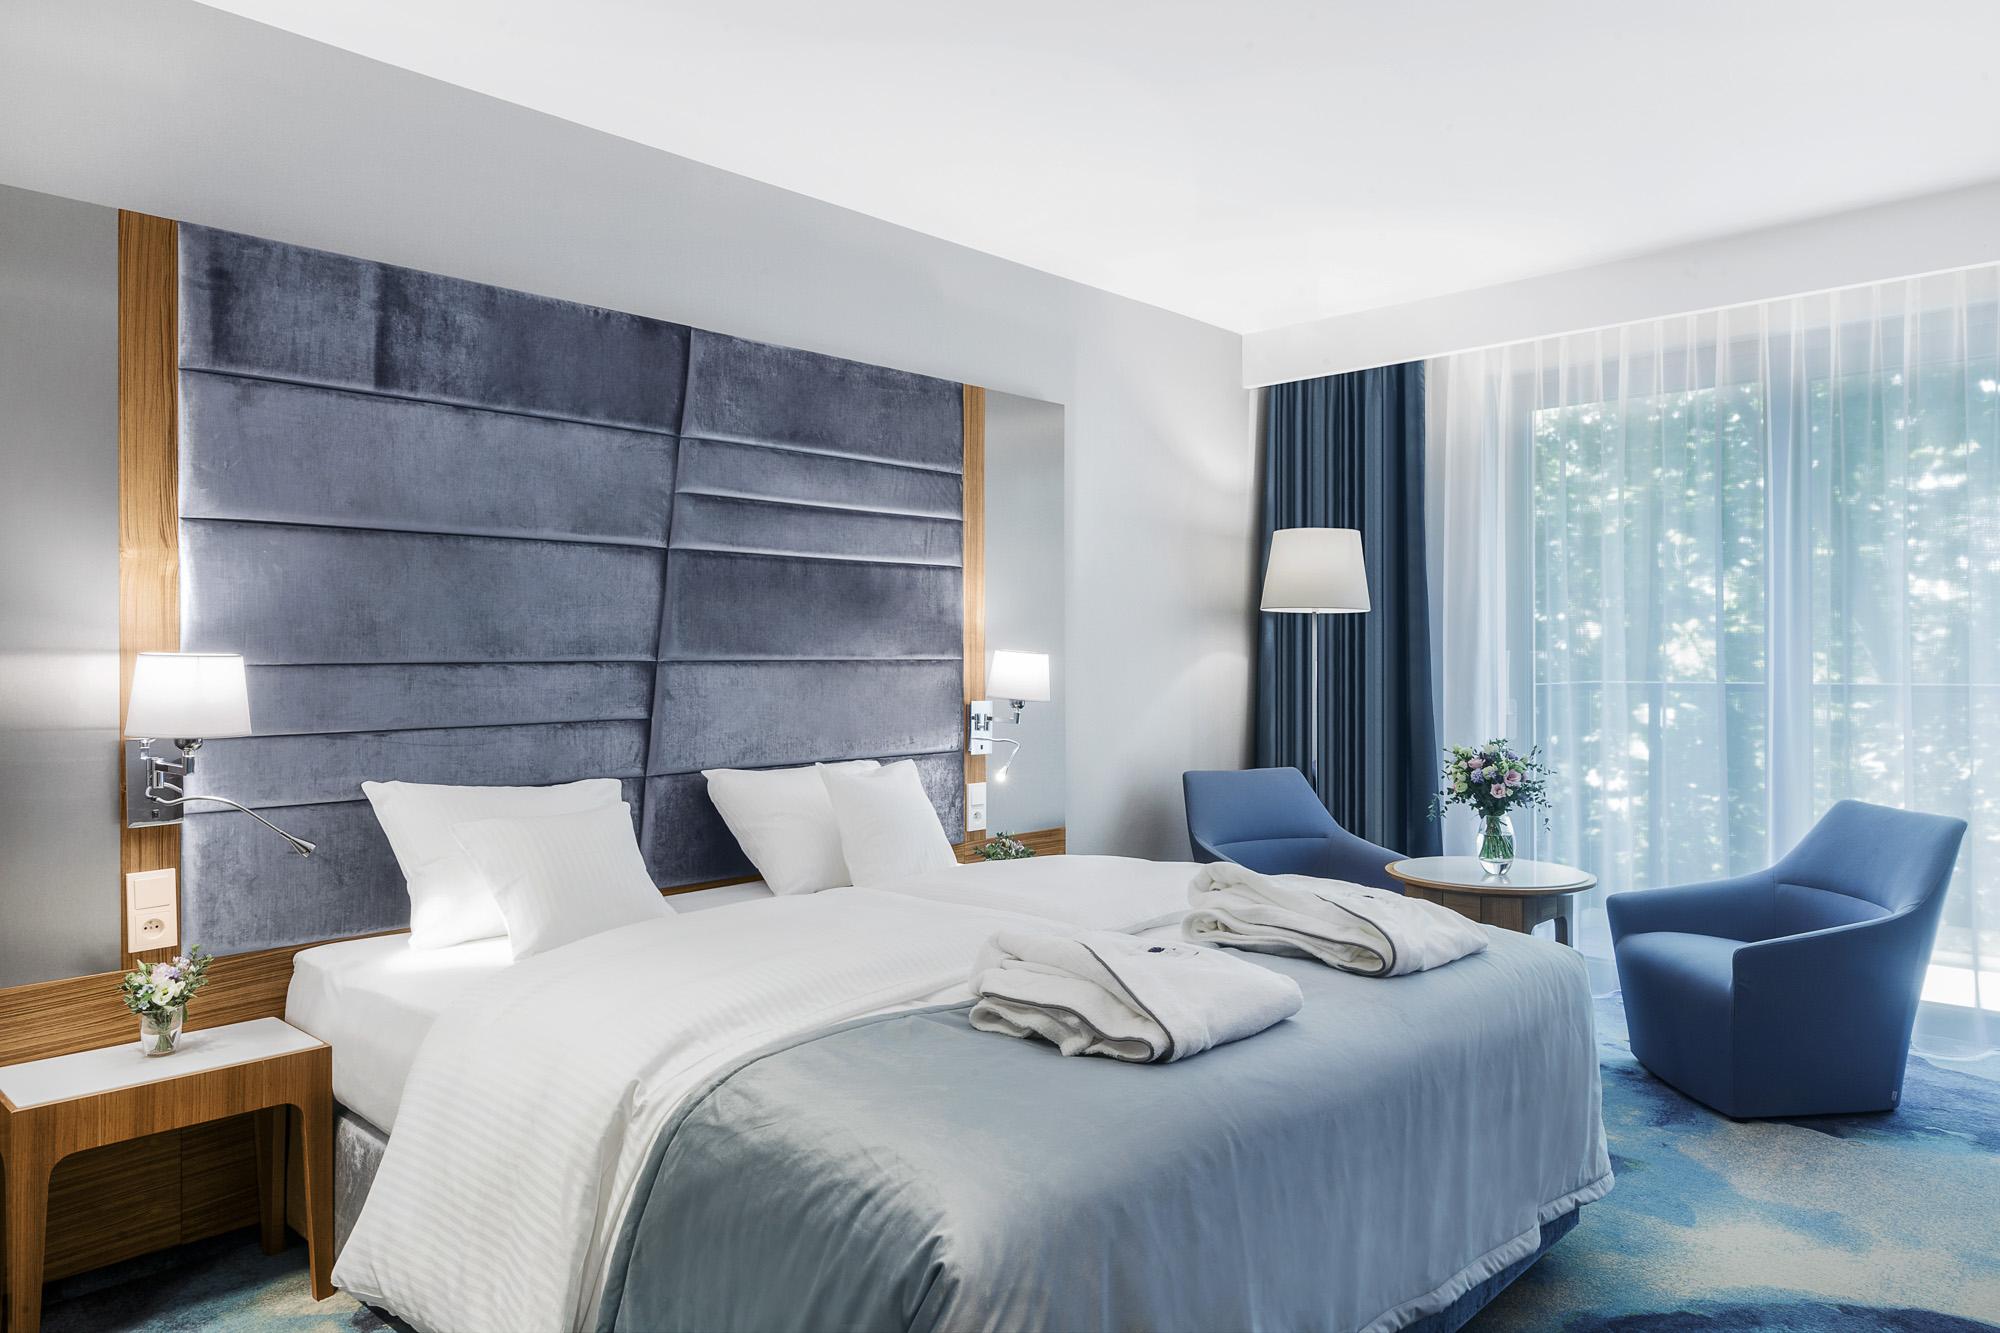 Hotel Testa - Pokój Standard